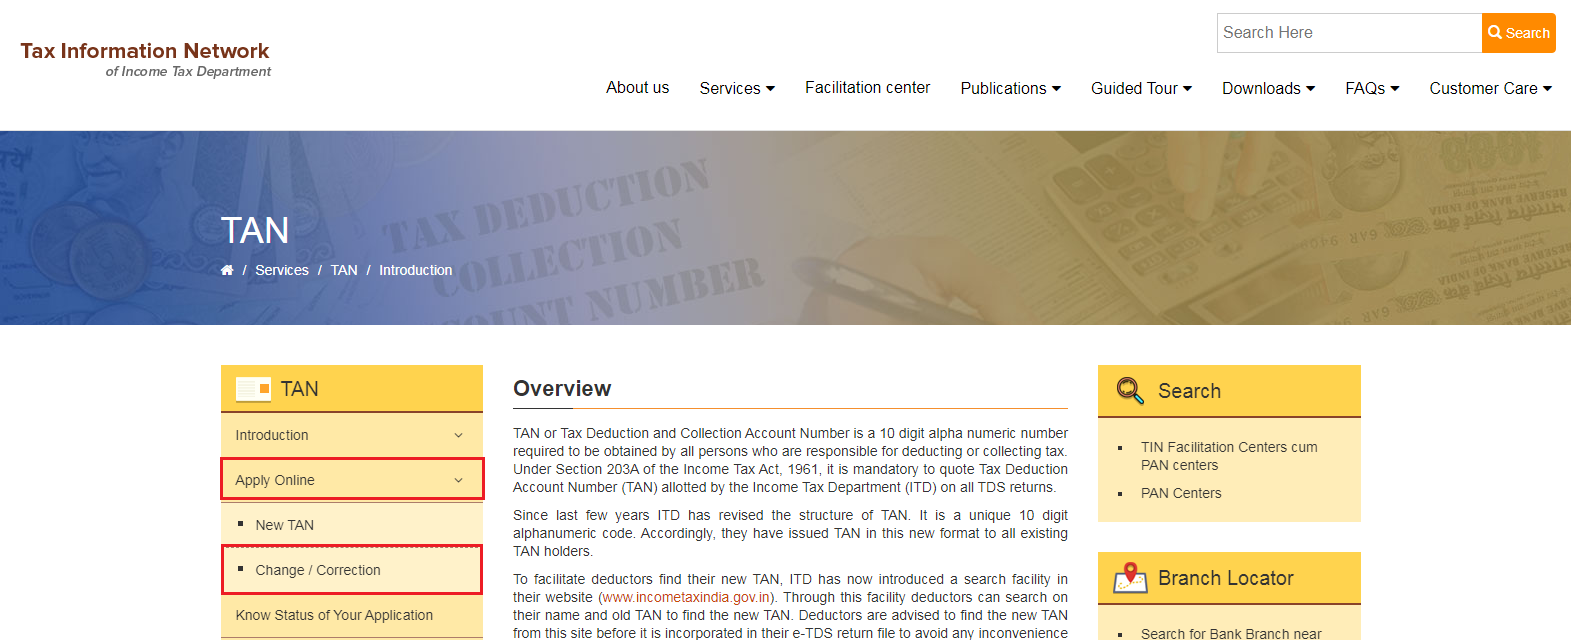 TIN-NSDL - Change or Correction TAN Option